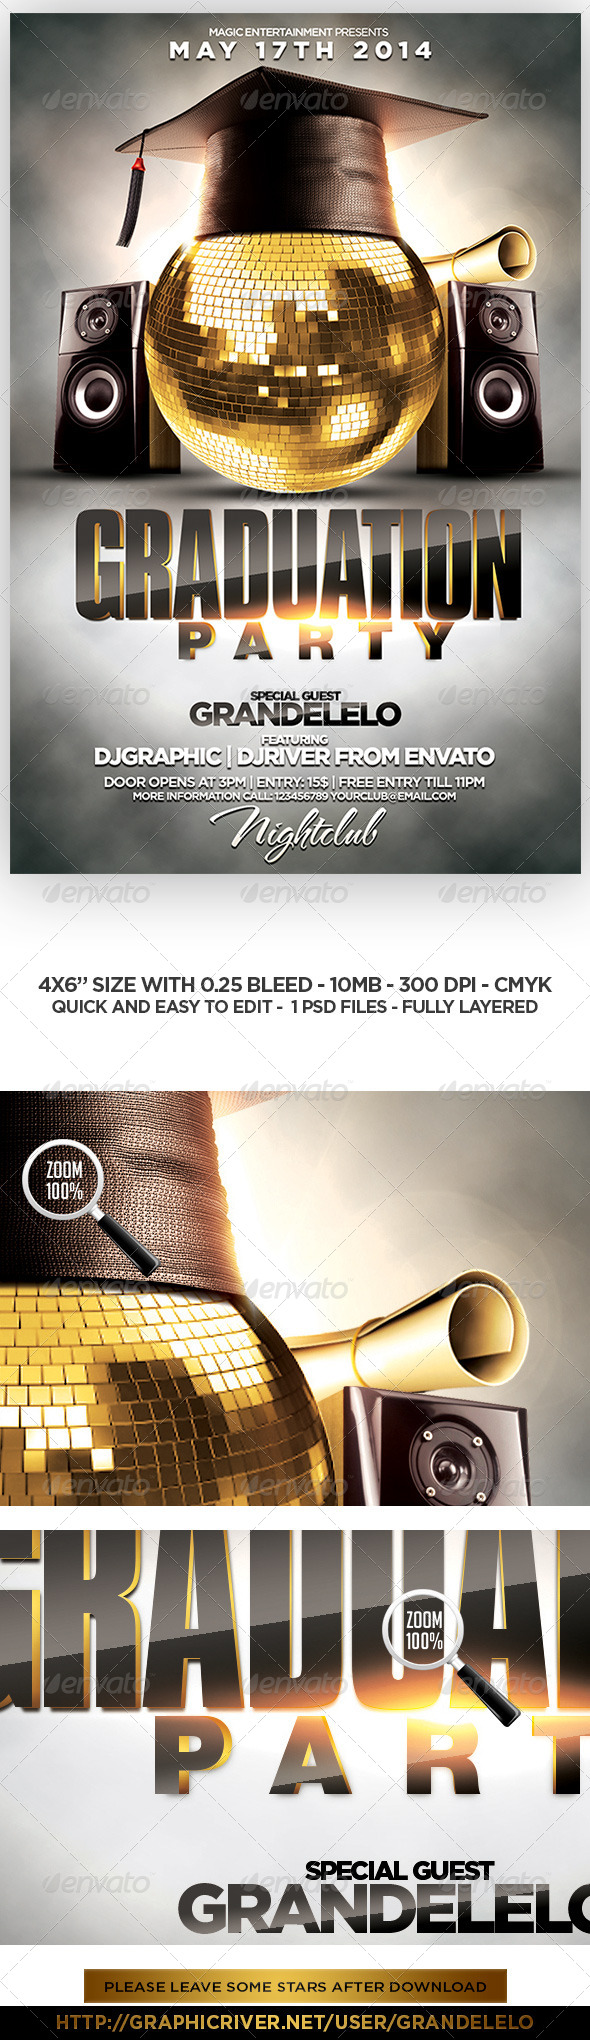 GraphicRiver Graduation Party Flyer Template 7700550